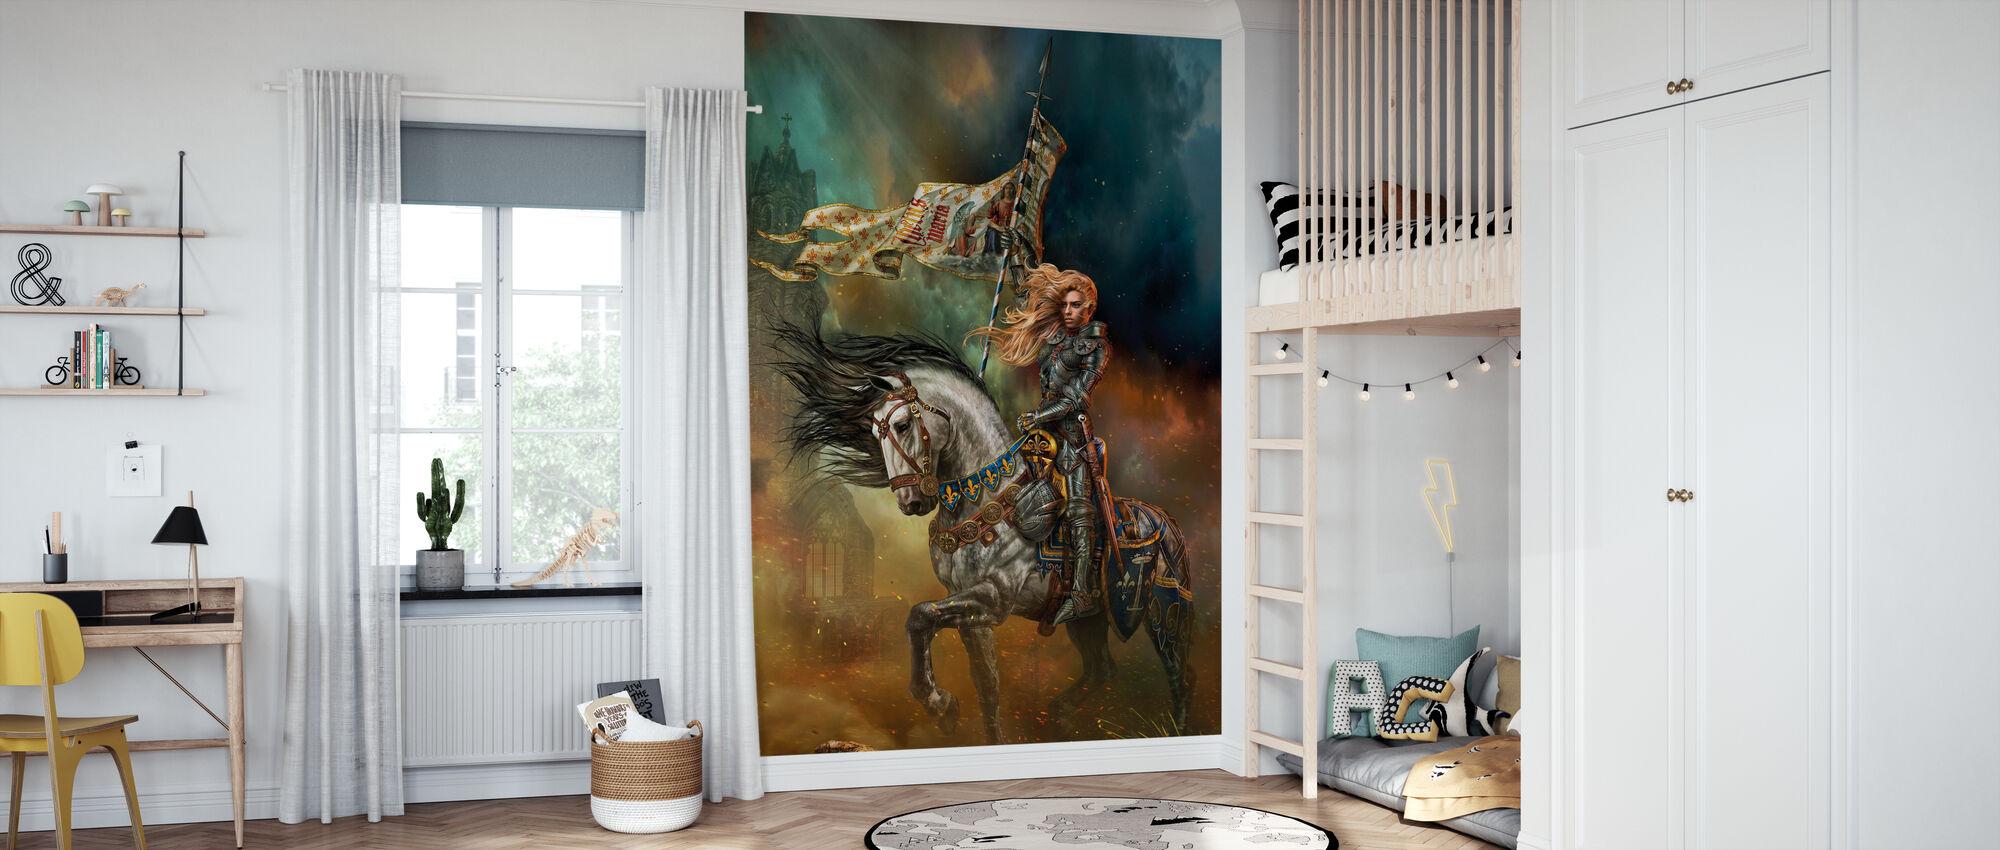 Joan of Arc - Wallpaper - Kids Room